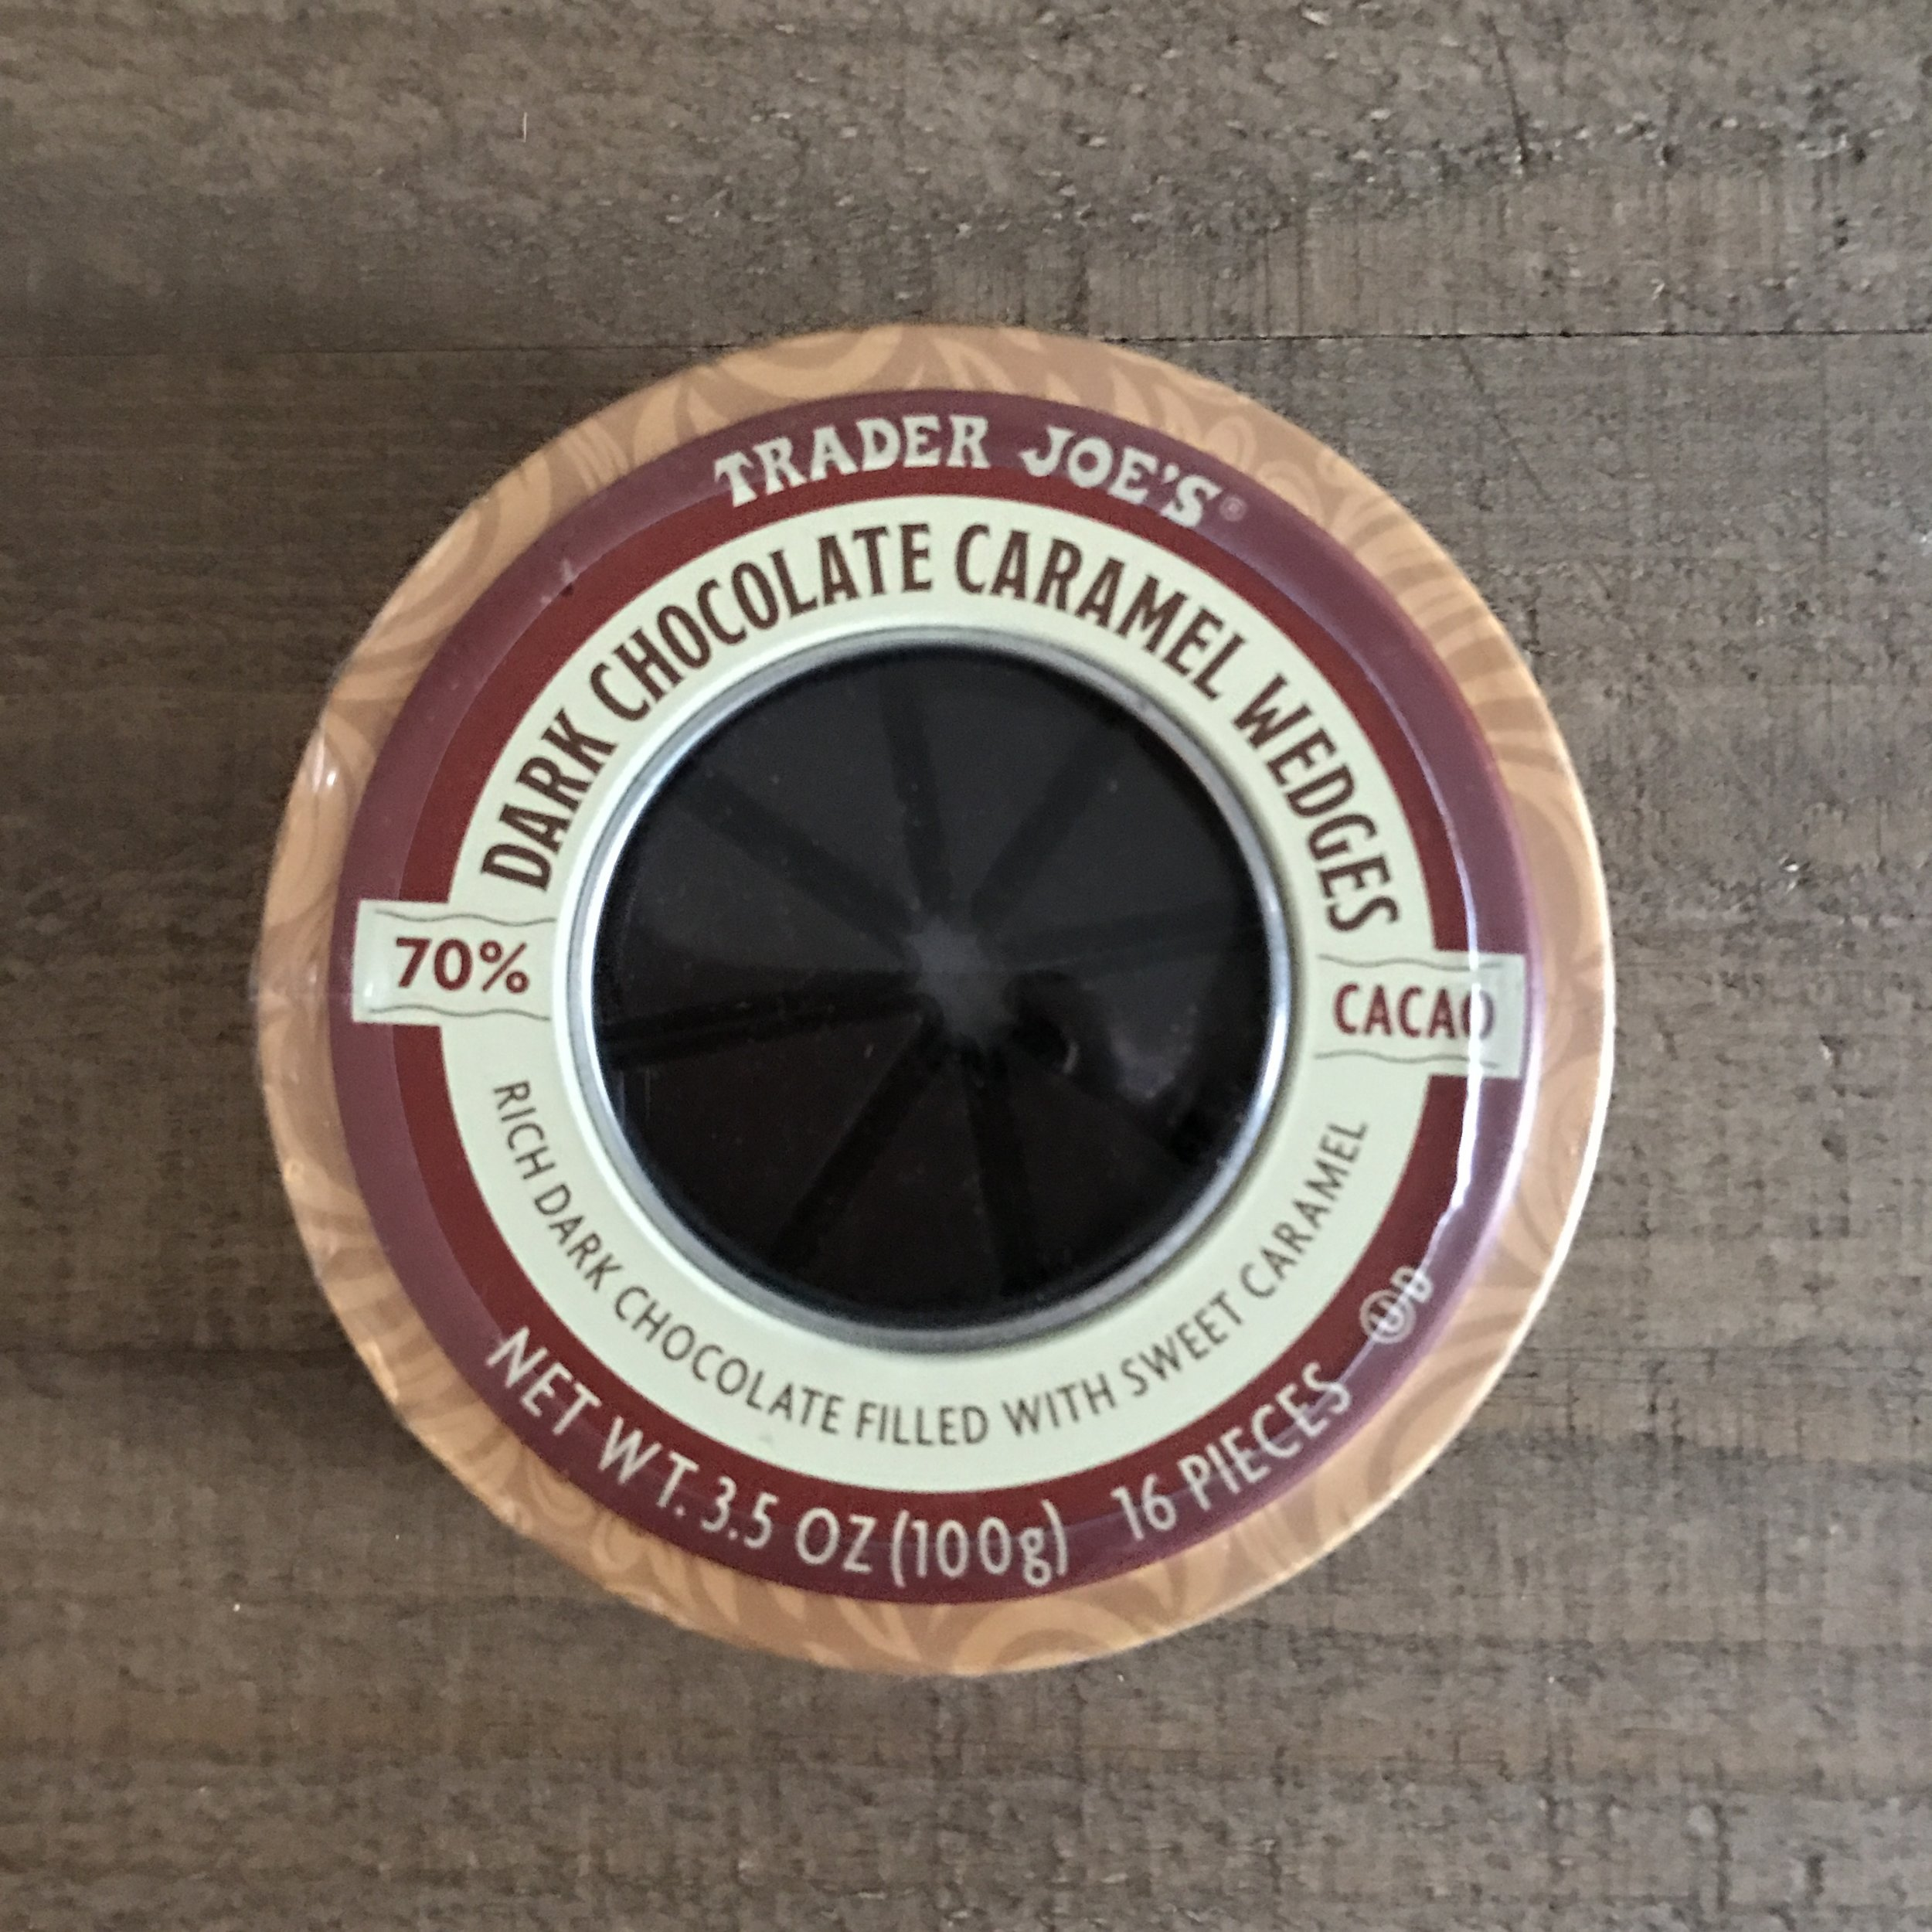 Trader Joe's Caramel Wedges